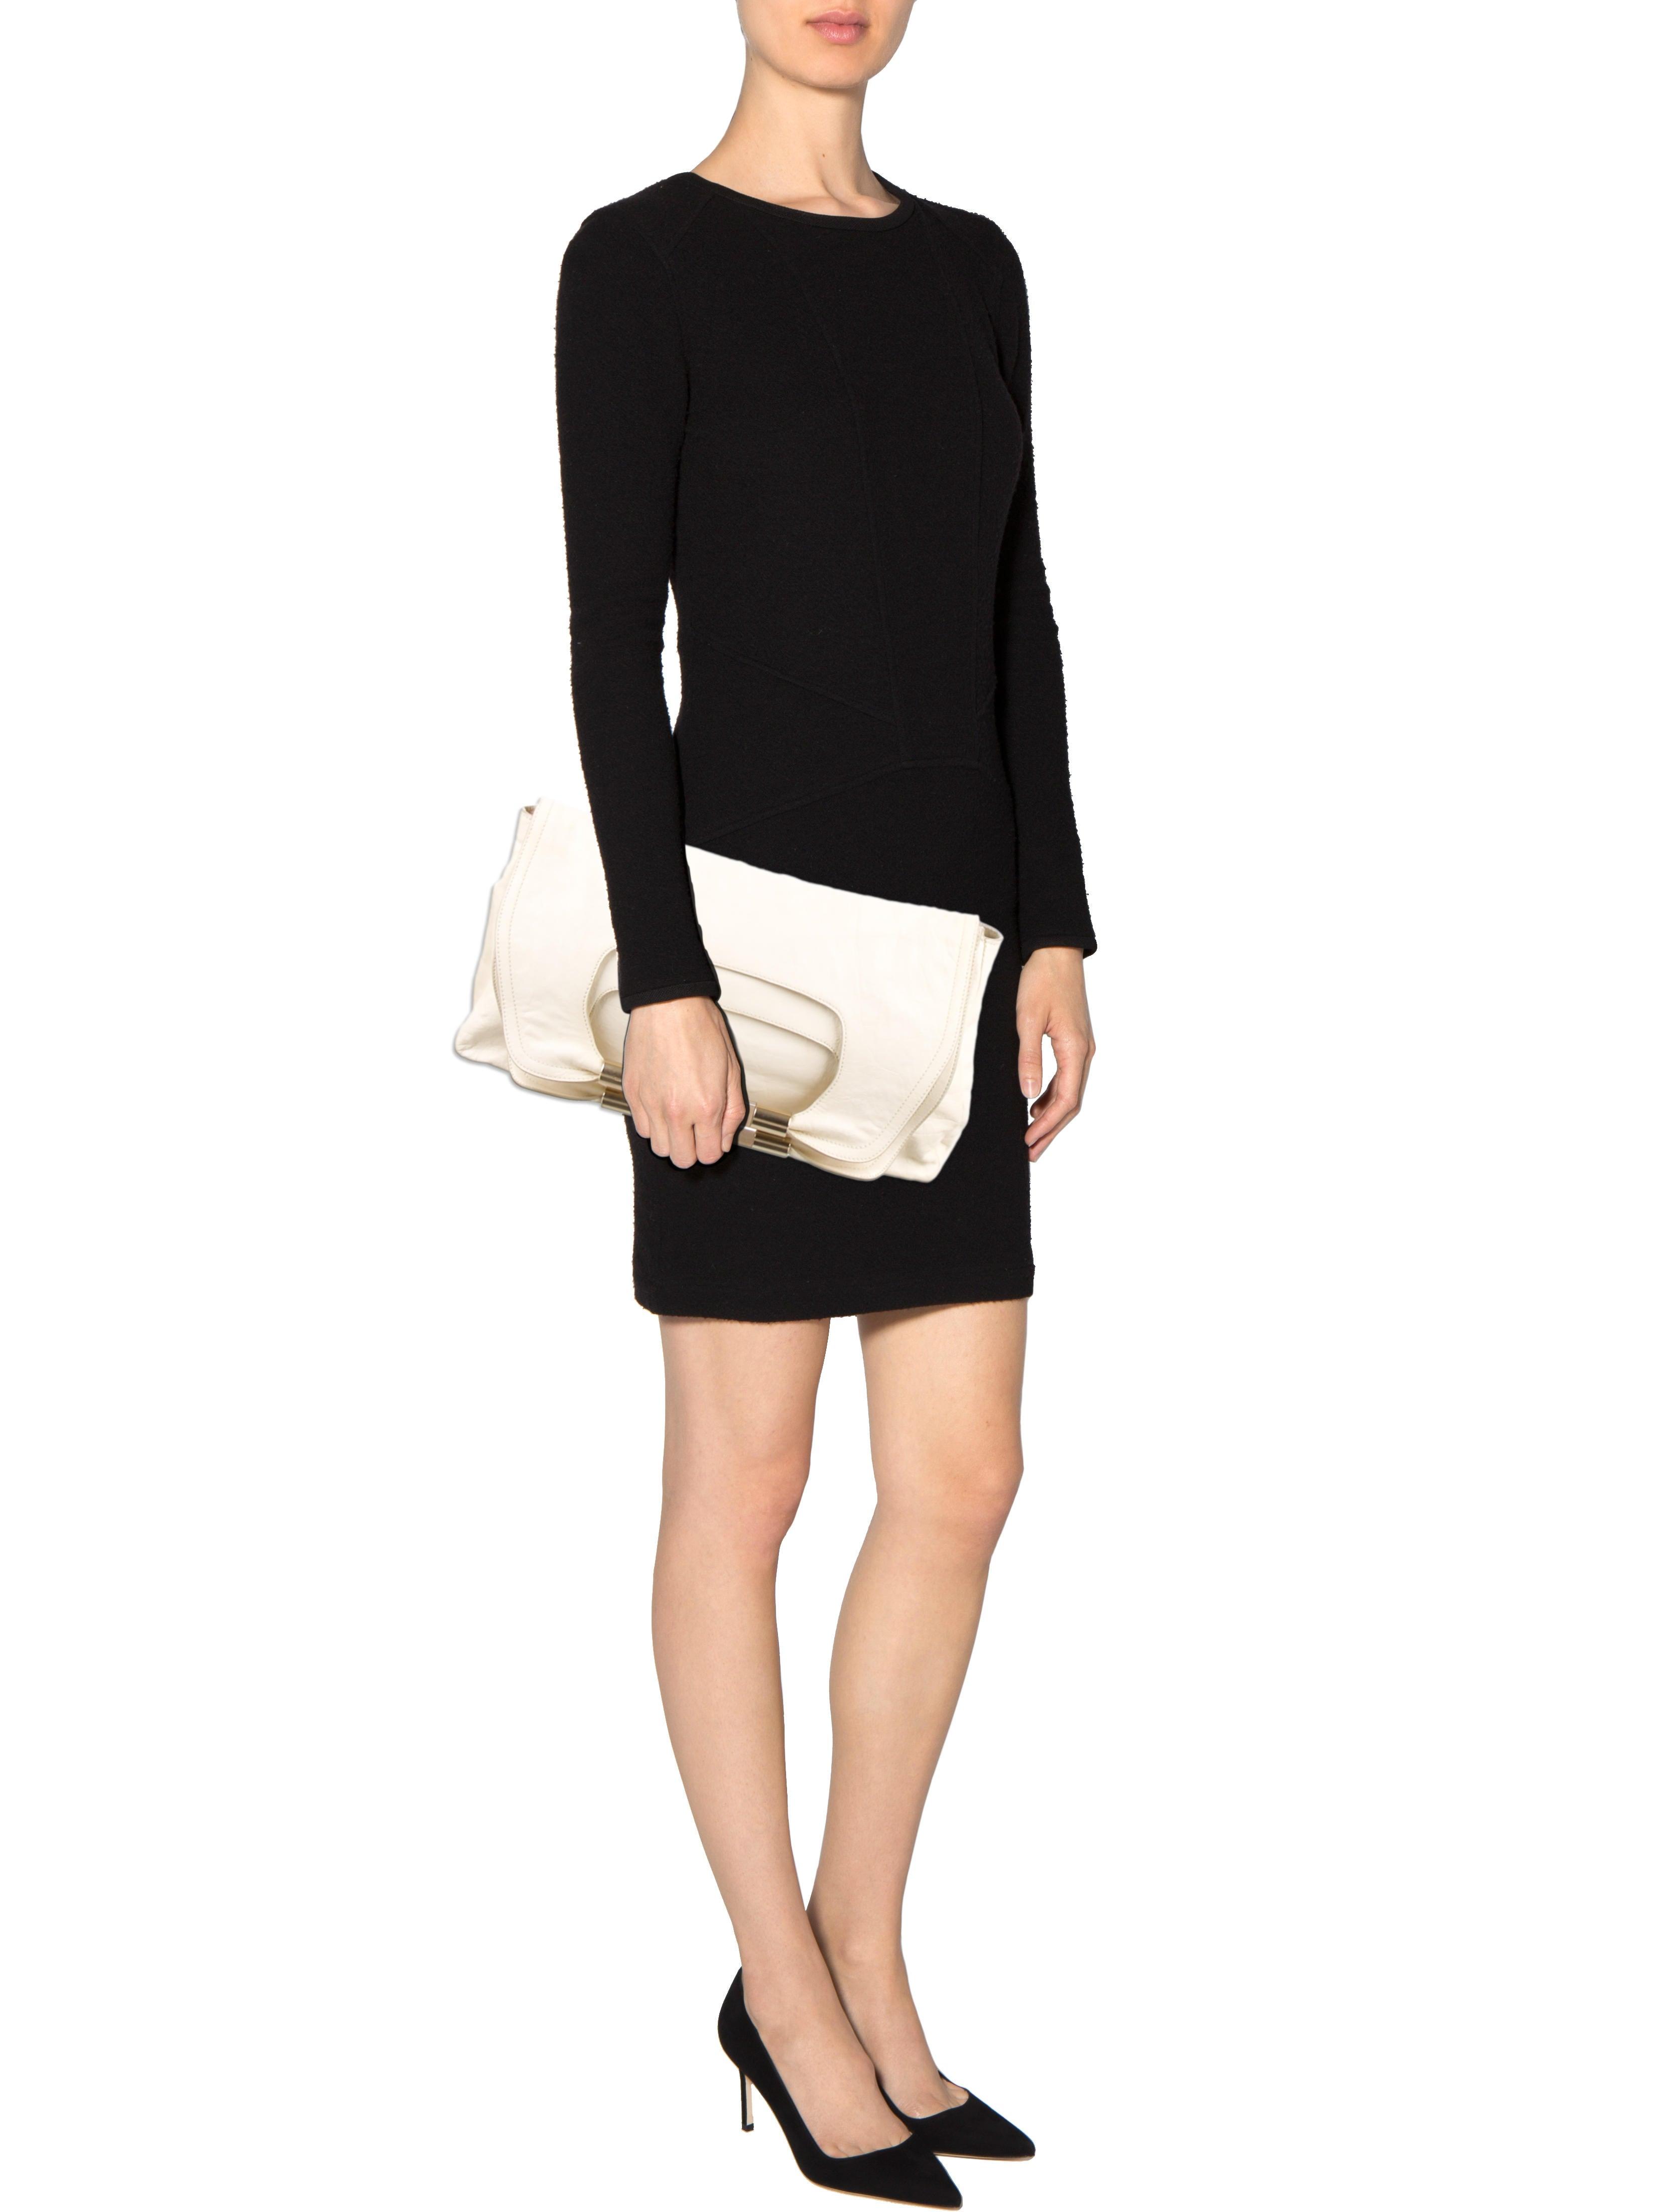 Chlo�� Large Nancy Clutch - Handbags - CHL37952 | The RealReal